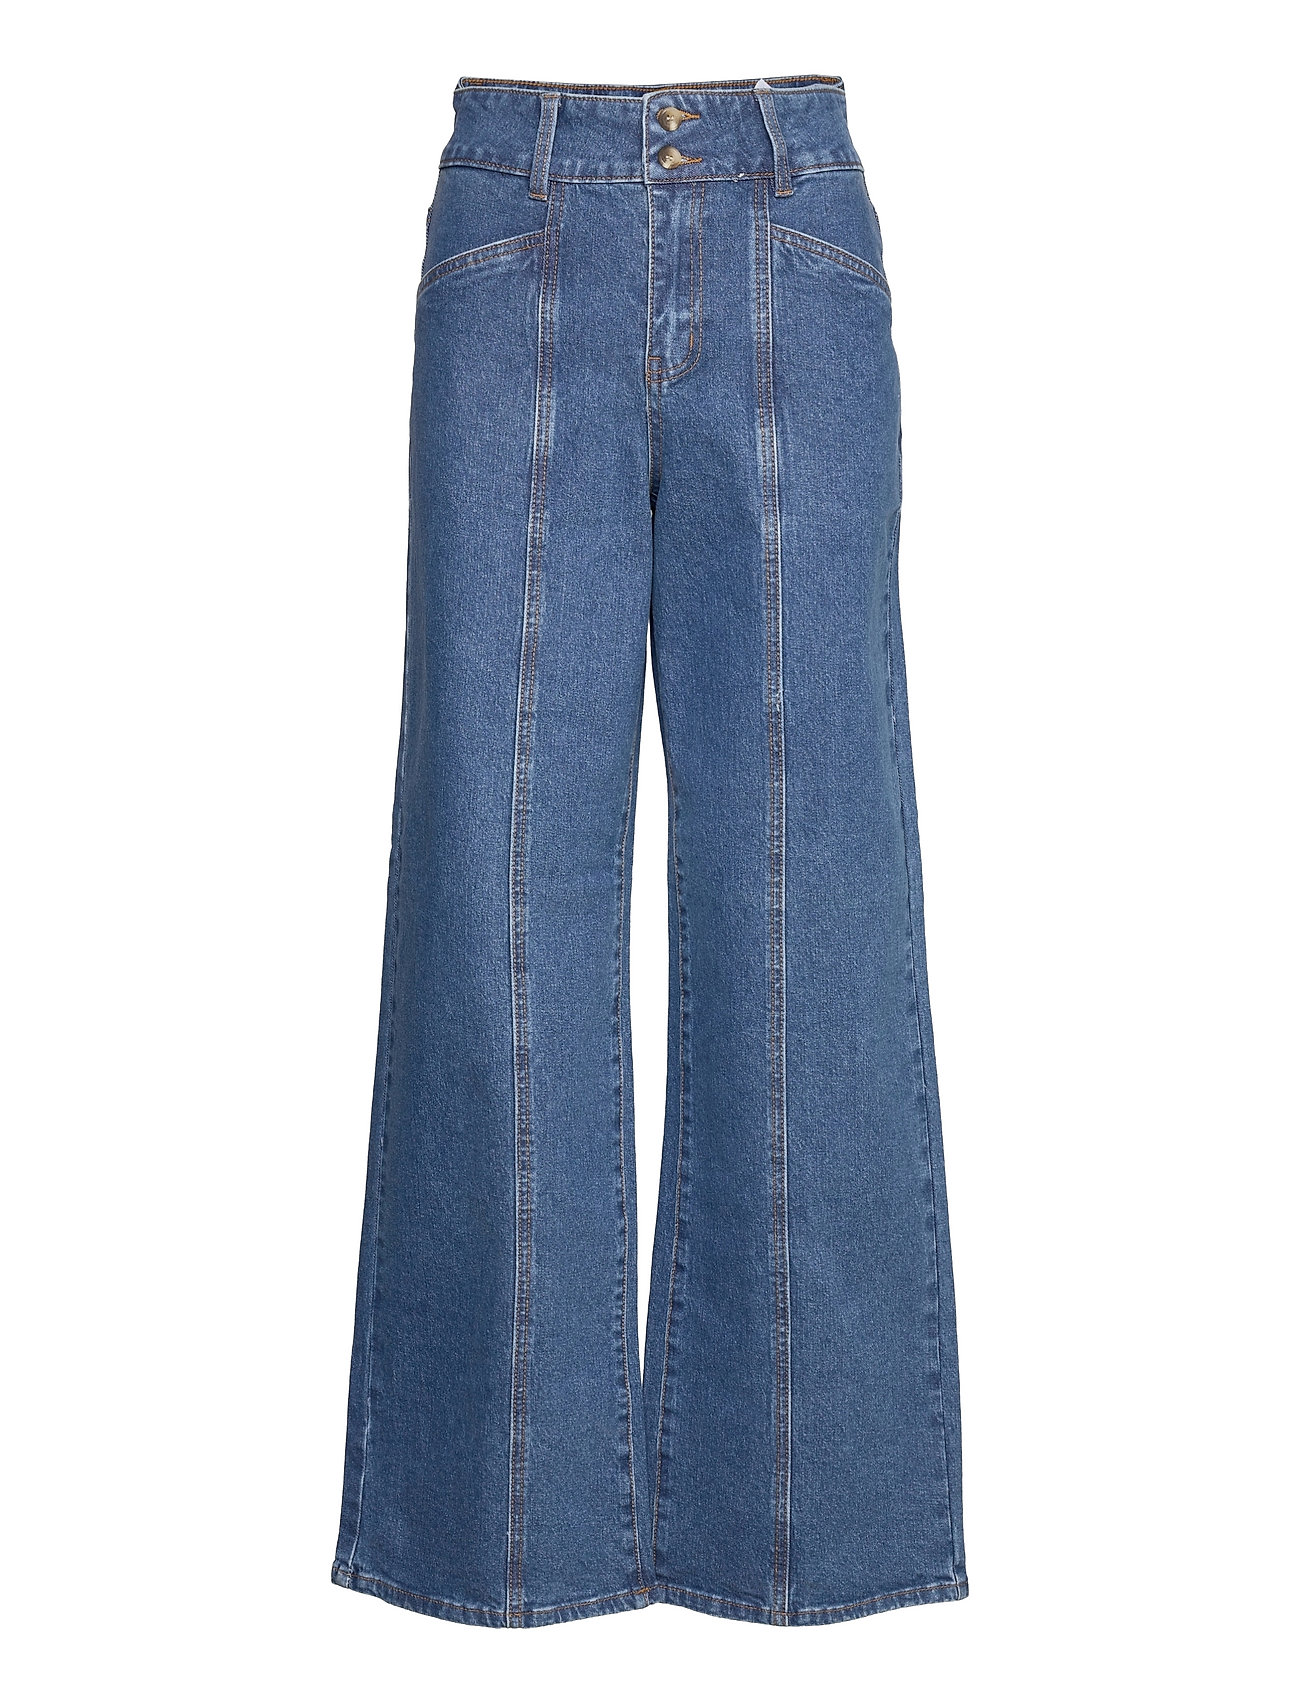 Objodessy Hw Jeans 116 Vide Jeans Blå Object